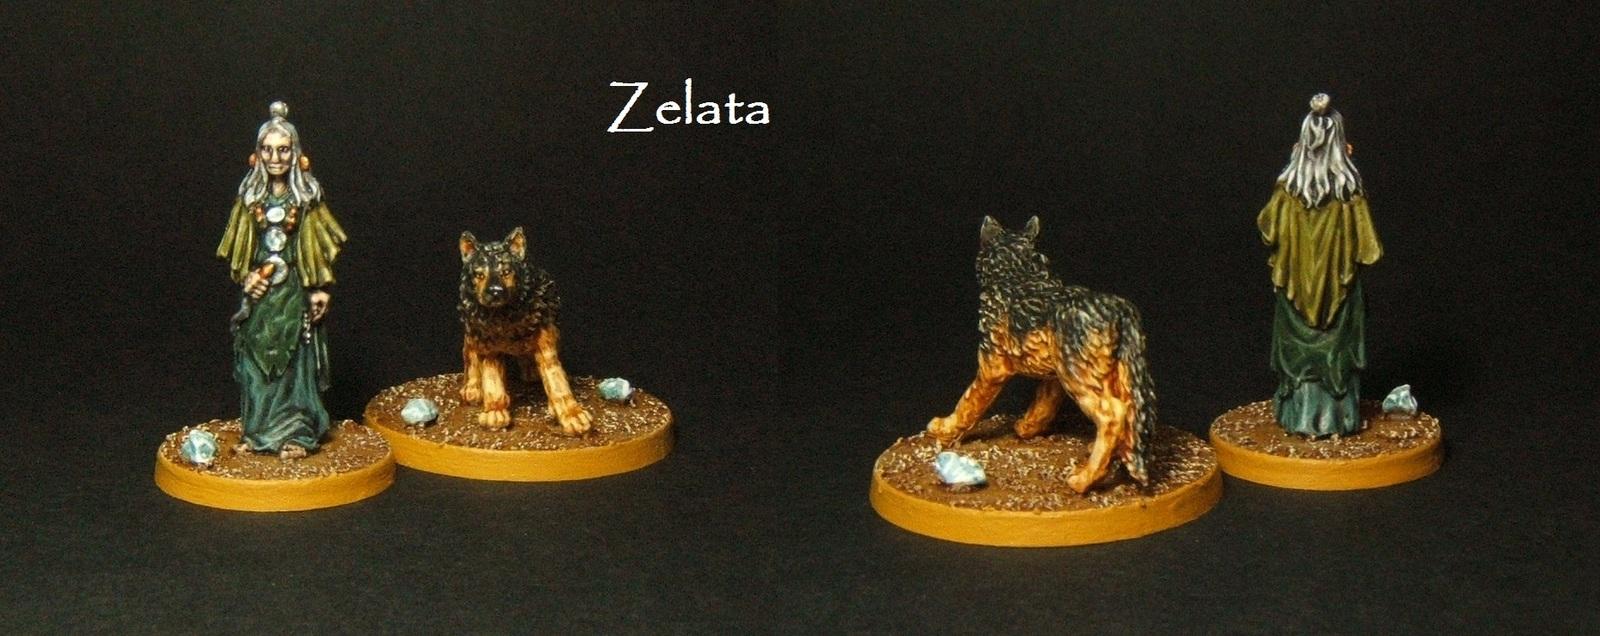 large.Zelata.jpg.83ff7b1419ceb4a425d4dc3f67d1329d.jpg